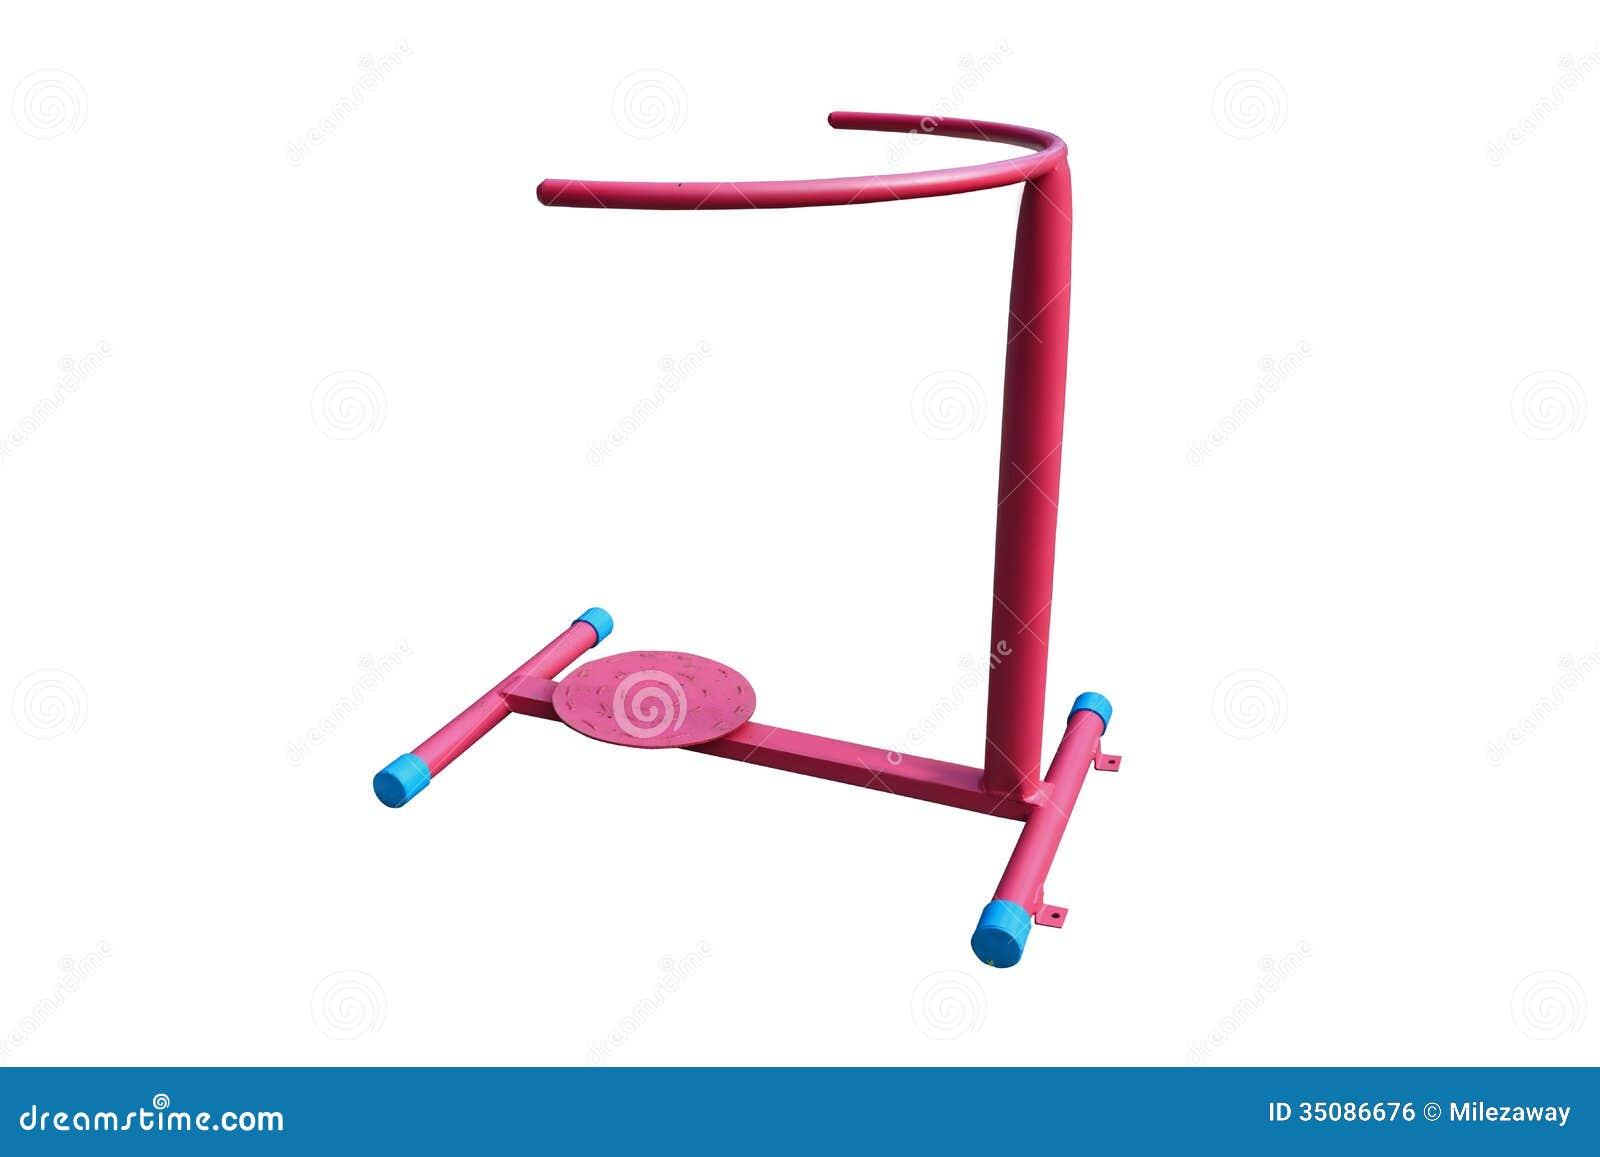 waist exercise machine